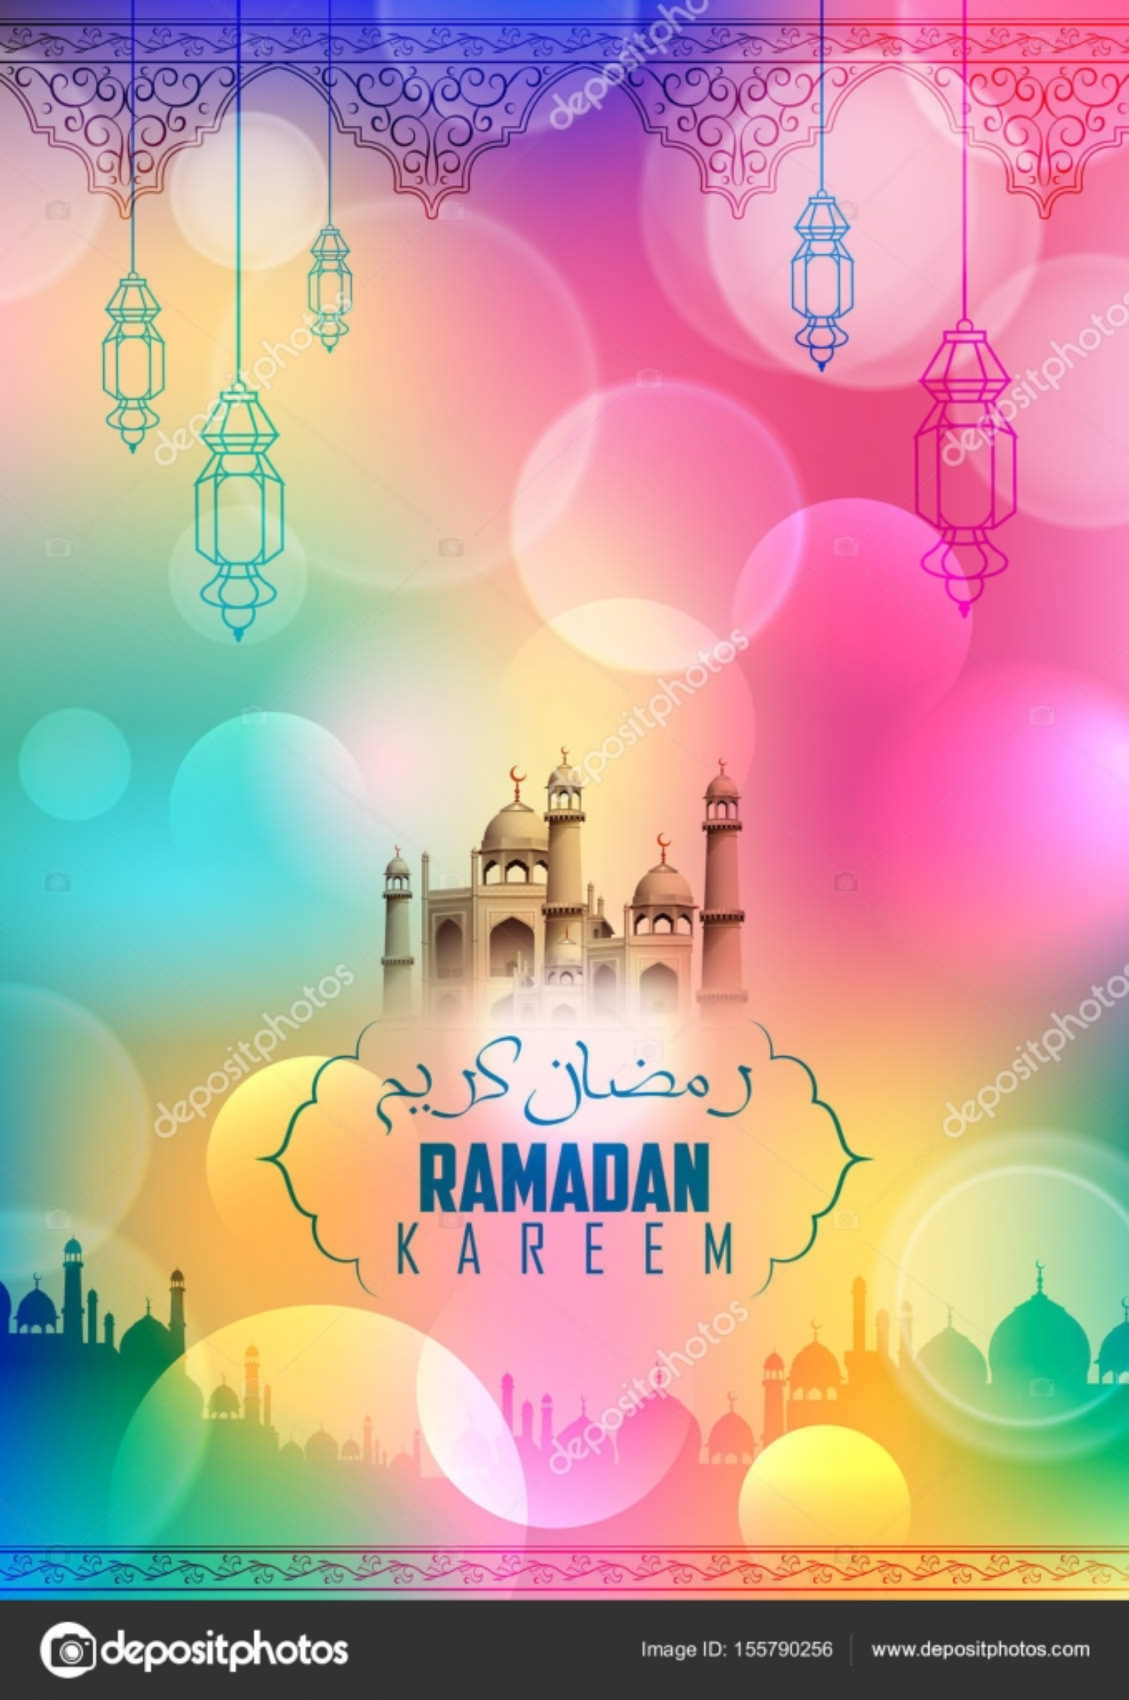 Ramadan kareem generous ramadan greetings in arabic freehand with ramadan kareem generous ramadan greetings in arabic freehand with mosque stock vector m4hsunfo